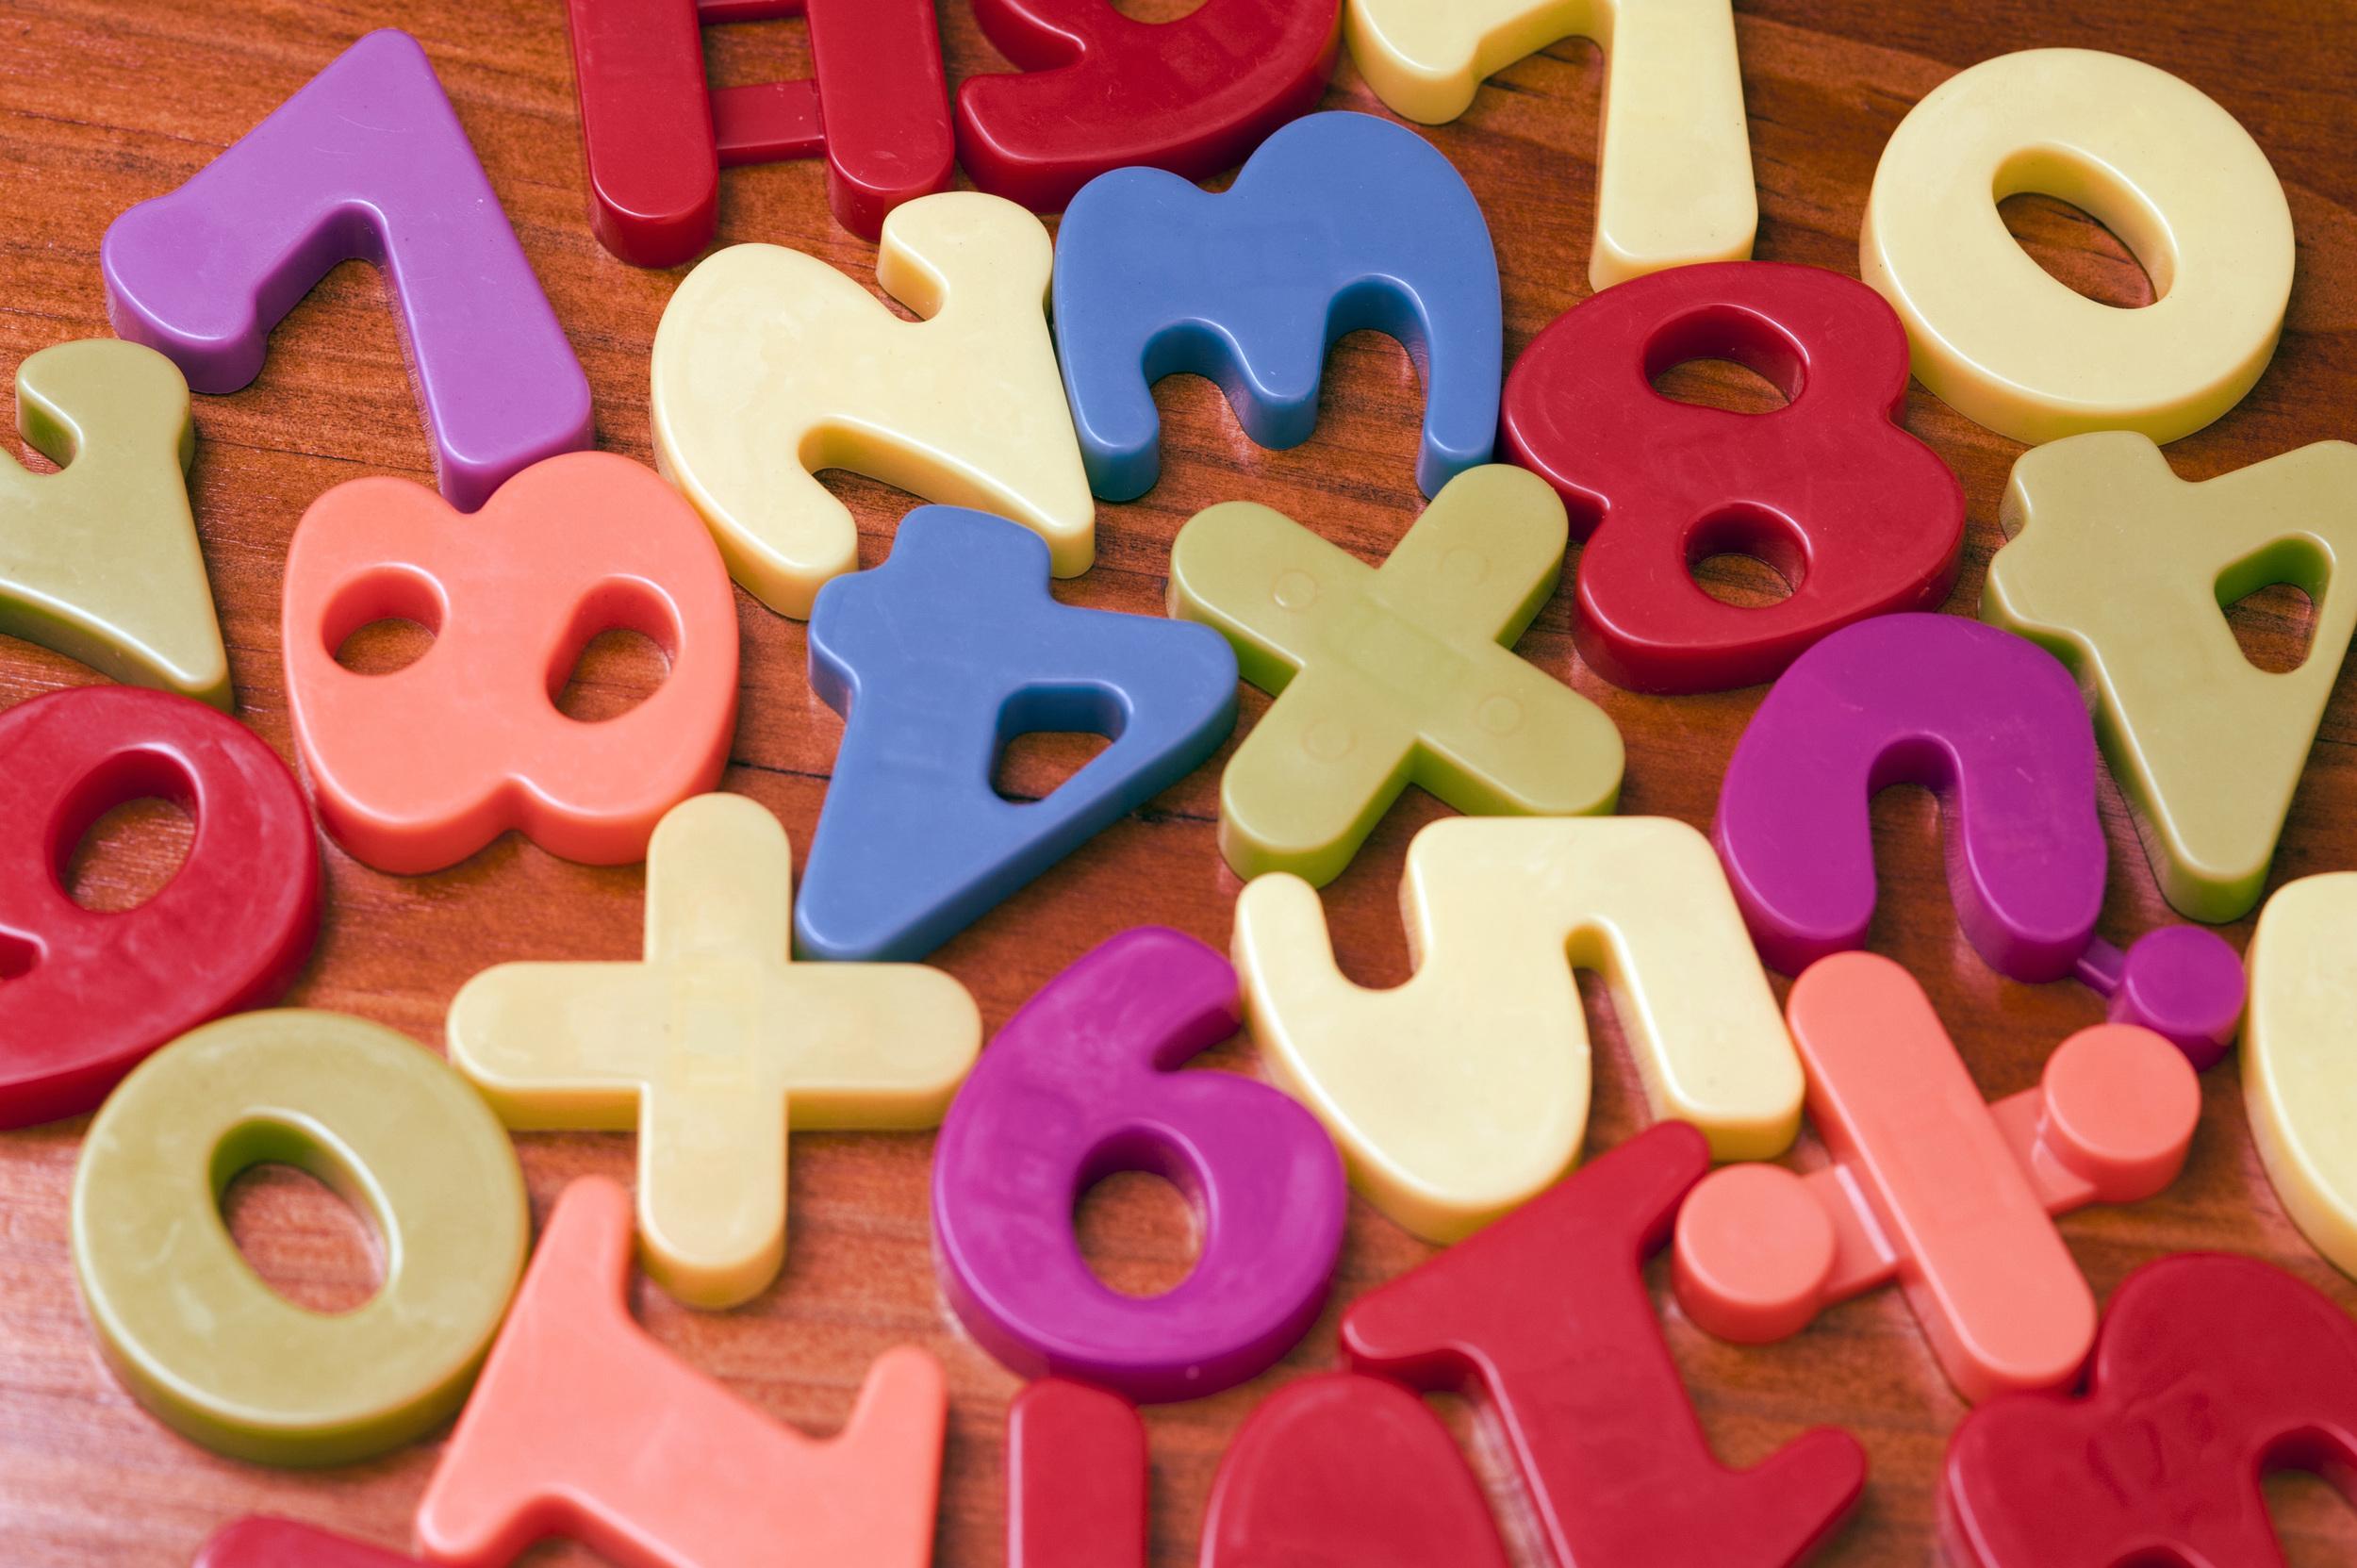 Plastic numbers for teaching mathematics